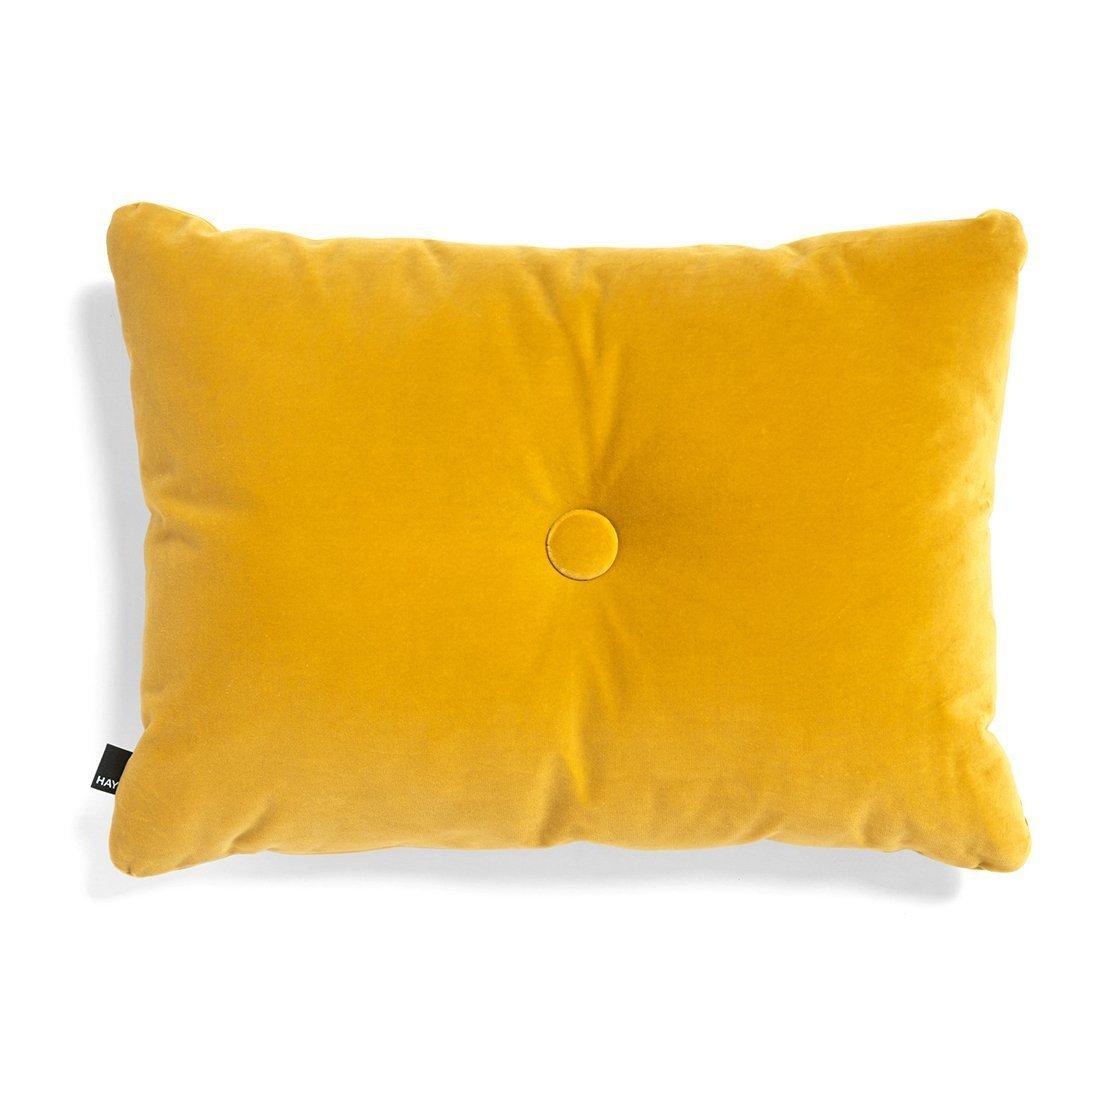 HAY Dot Cushion 1 Knoop Velours Kussen - Geel